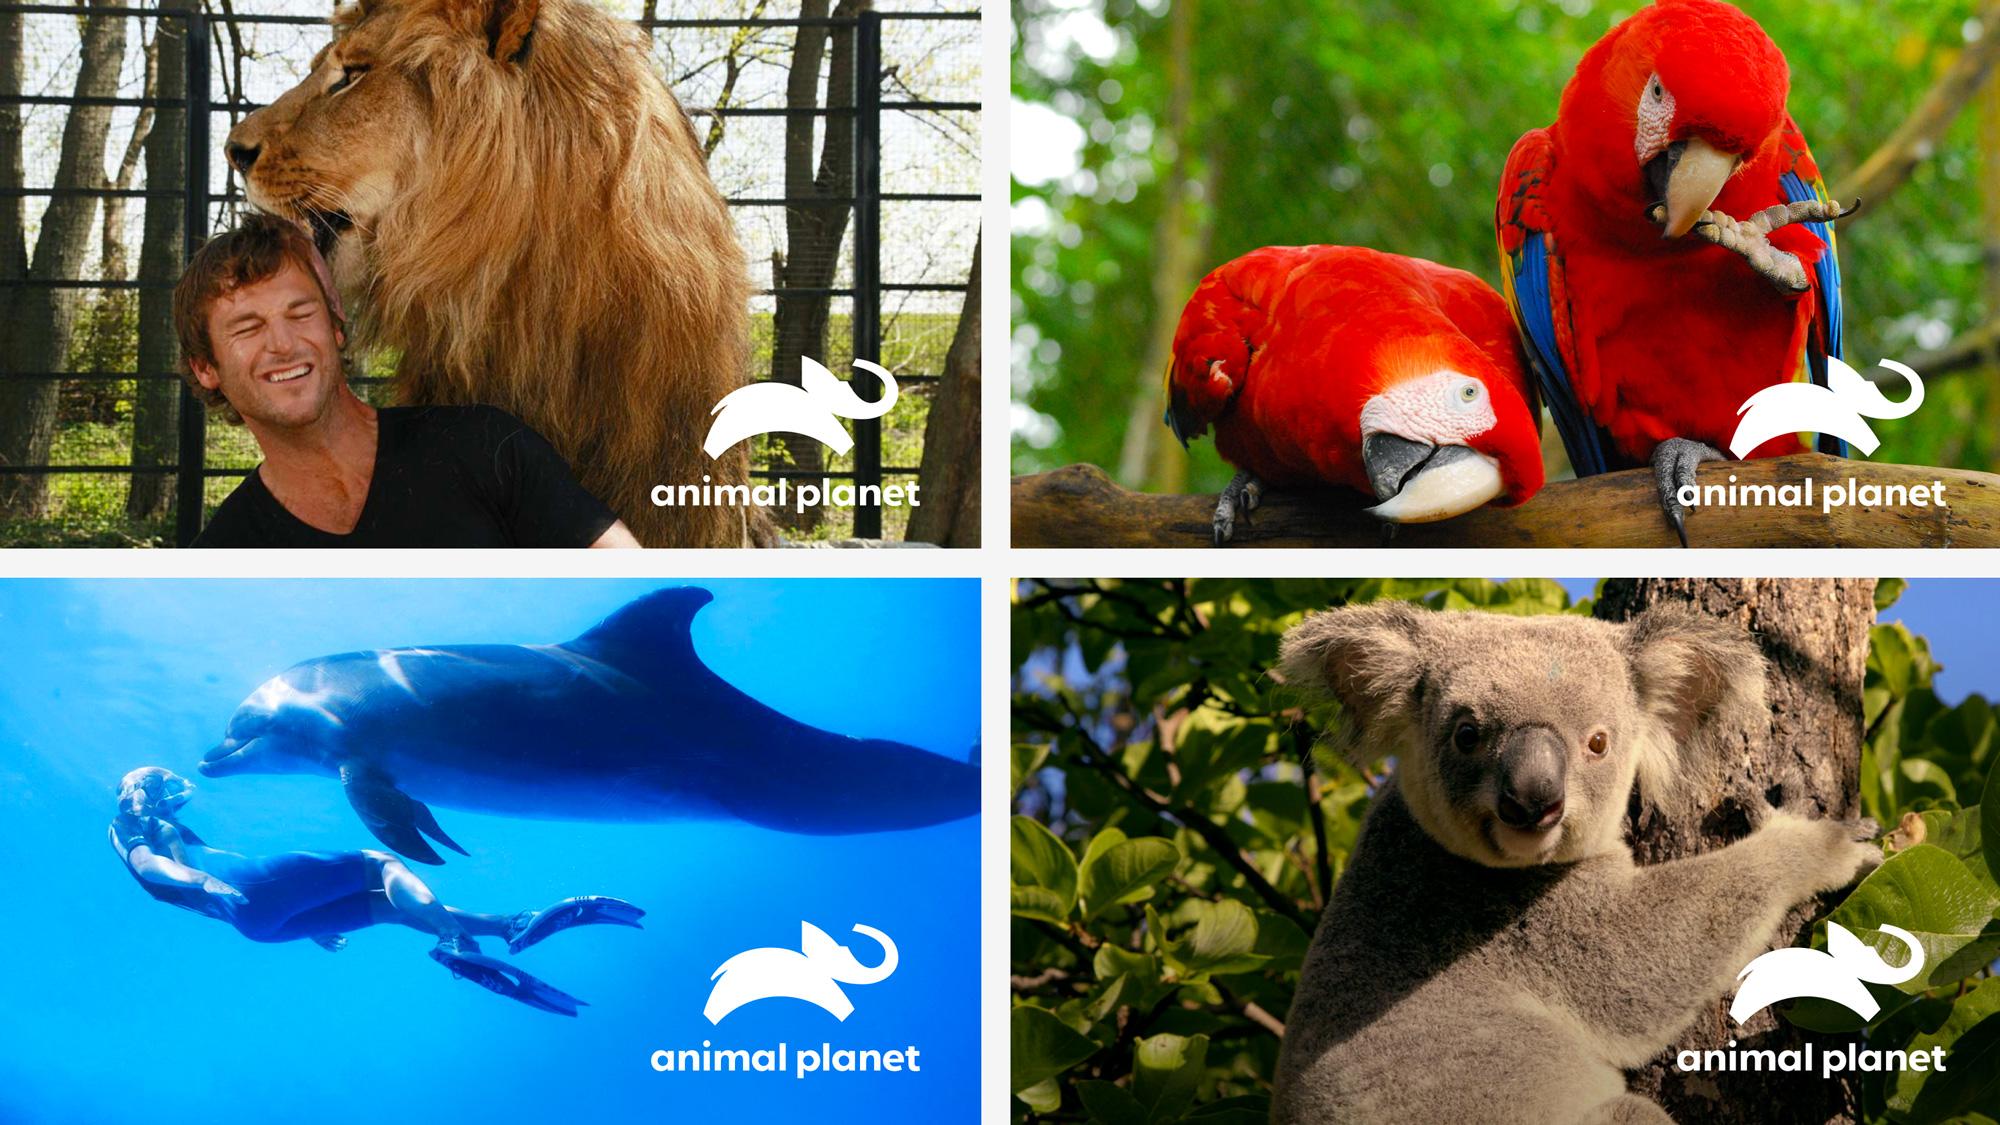 Animal Planet rebranding 2018 - wizualizacje logo